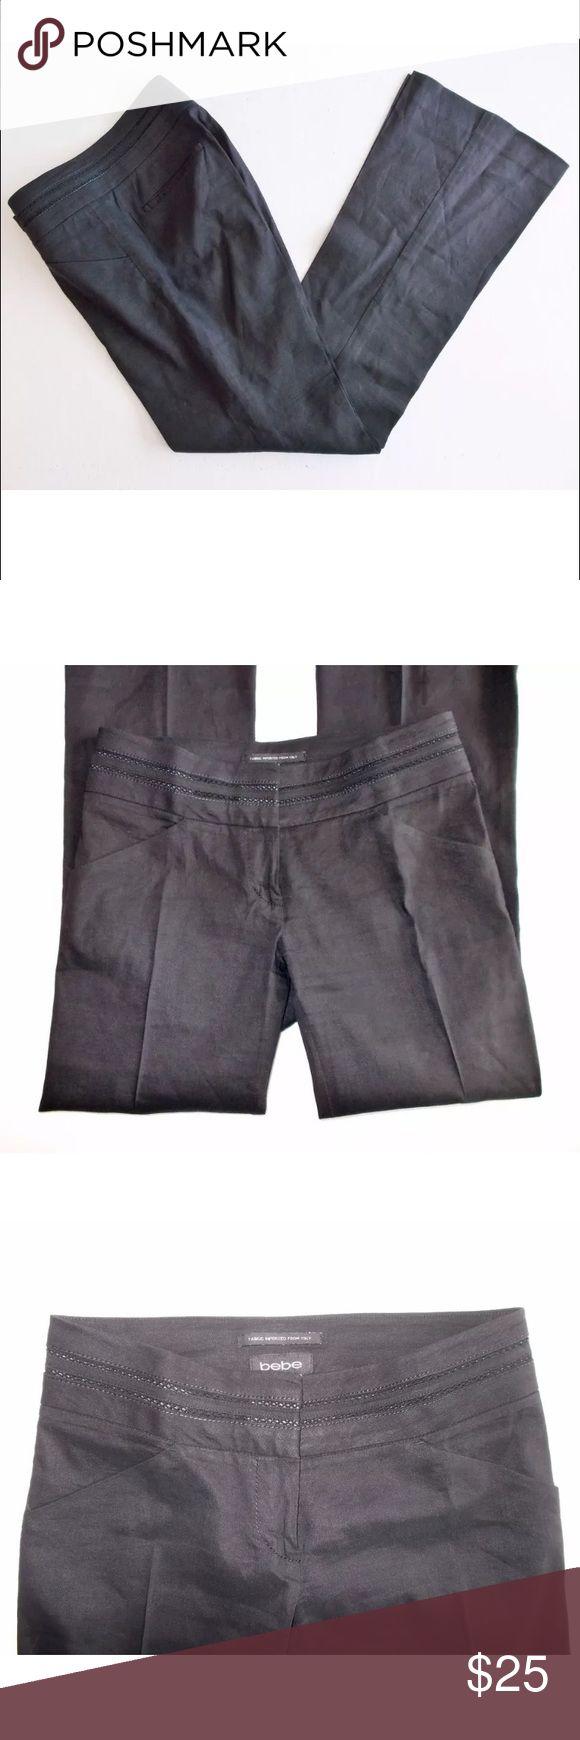 "bebe Women's Linen Dress Pants Stretch Size 2/P bebe Women's Linen Stretch Dress Pants Size 2/P Black Straight Leg BootCut Slacks! Pre-Owned! Excellent Condition!! Inseam 31"" bebe Pants Straight Leg"